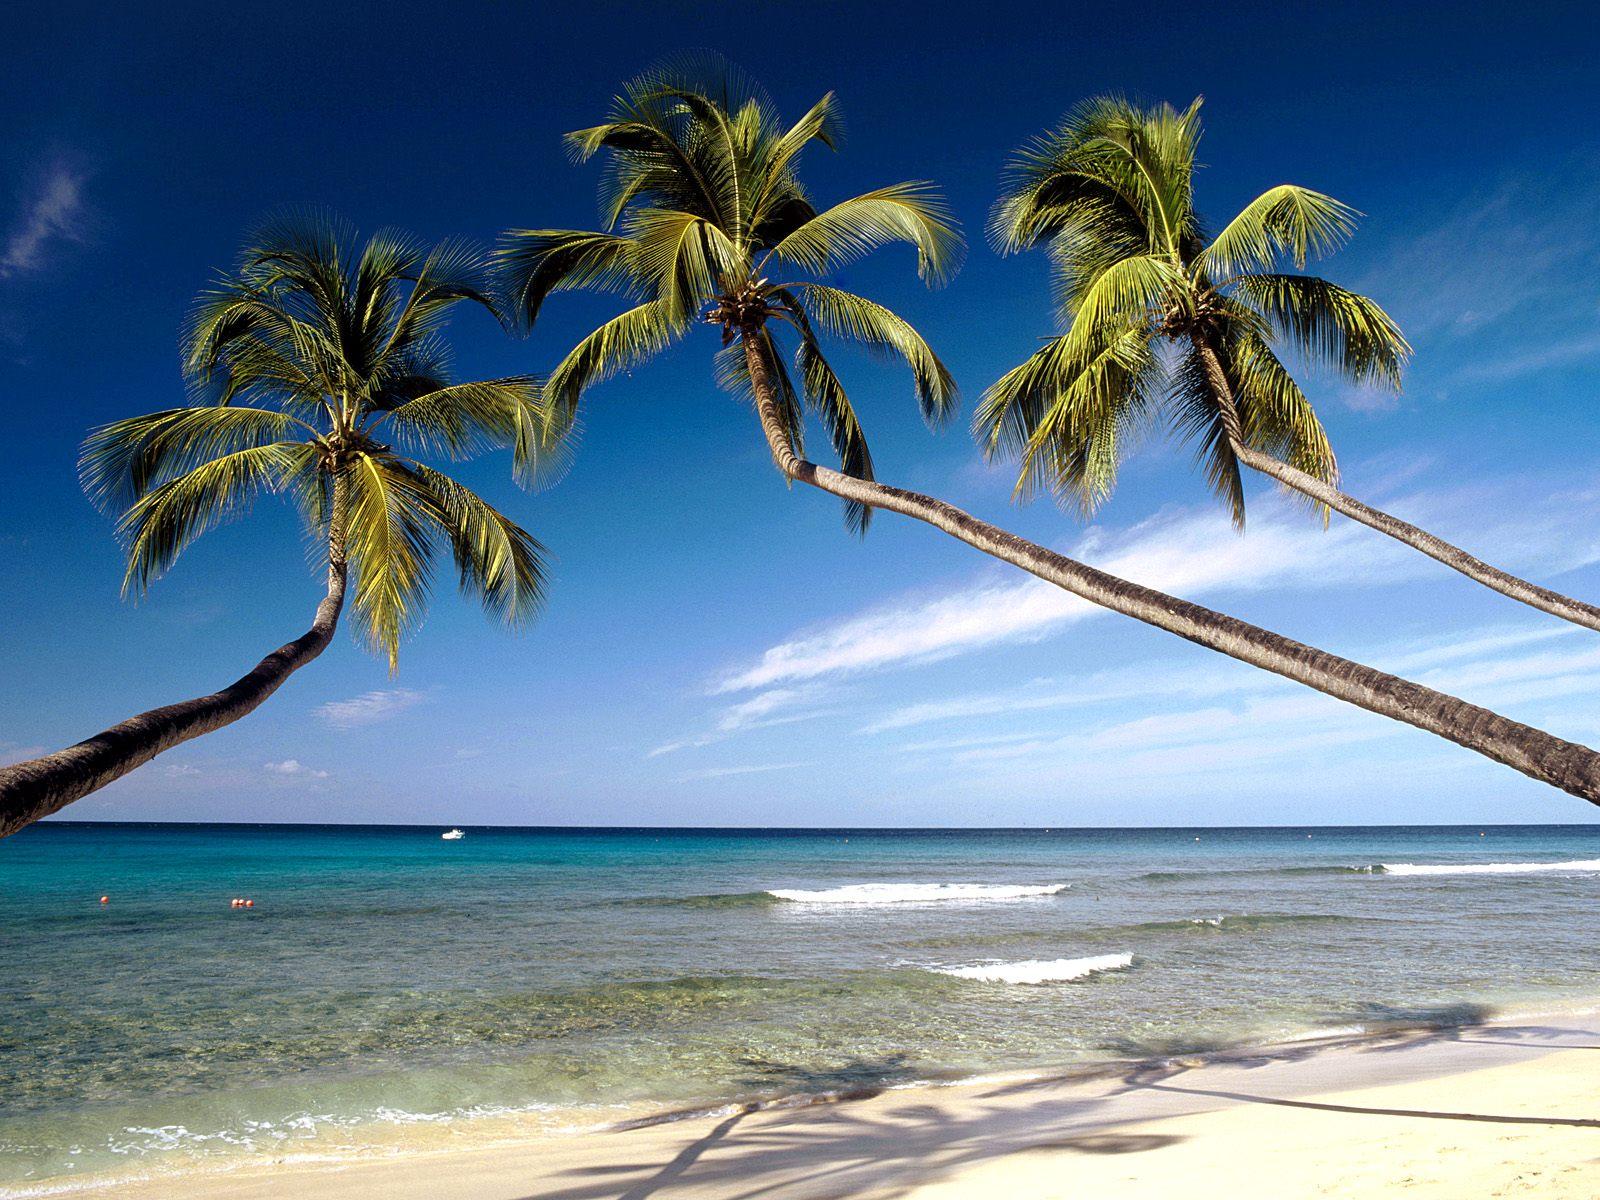 http://1.bp.blogspot.com/_OTLWHUxsXVQ/S8mh8NMFobI/AAAAAAAAB3w/AQQPK8I1xb0/s1600/Kings-Beach-West-Coast-Barbados-West-Indies.jpg